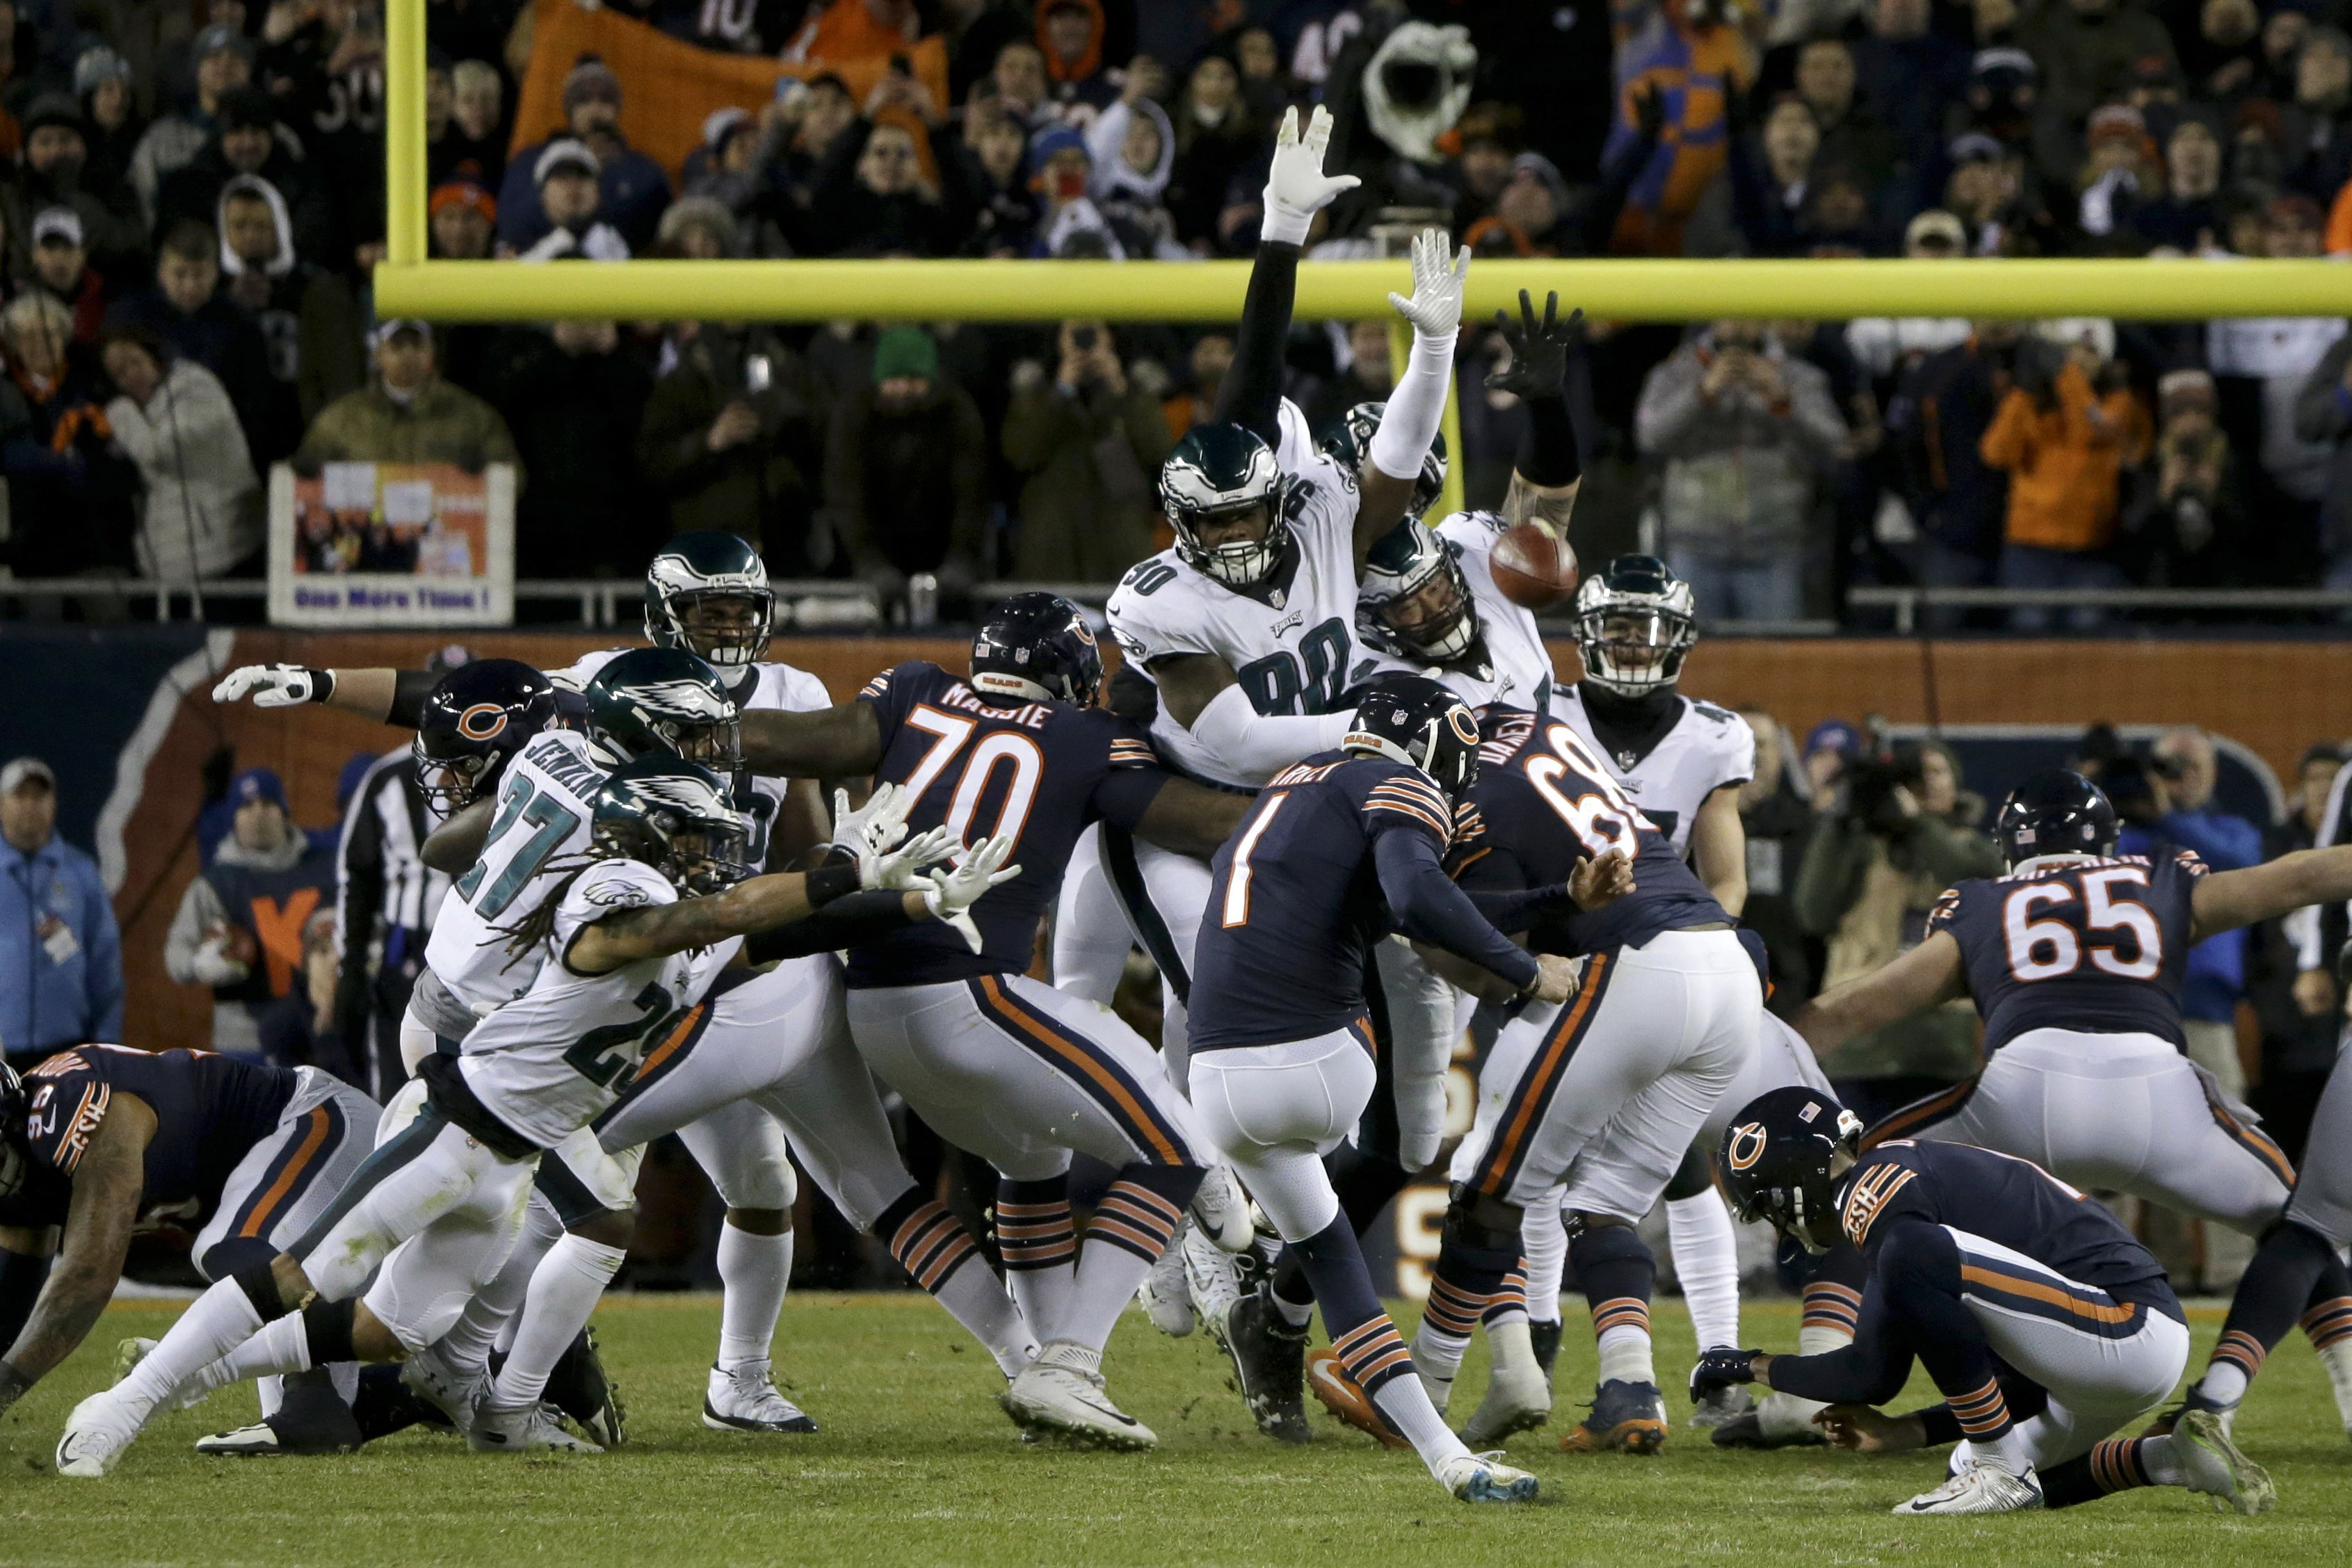 We Love La Could Two La Teams Meet In The Super Bowl Washington Post Eagles Vs Nfl Chicago Bears